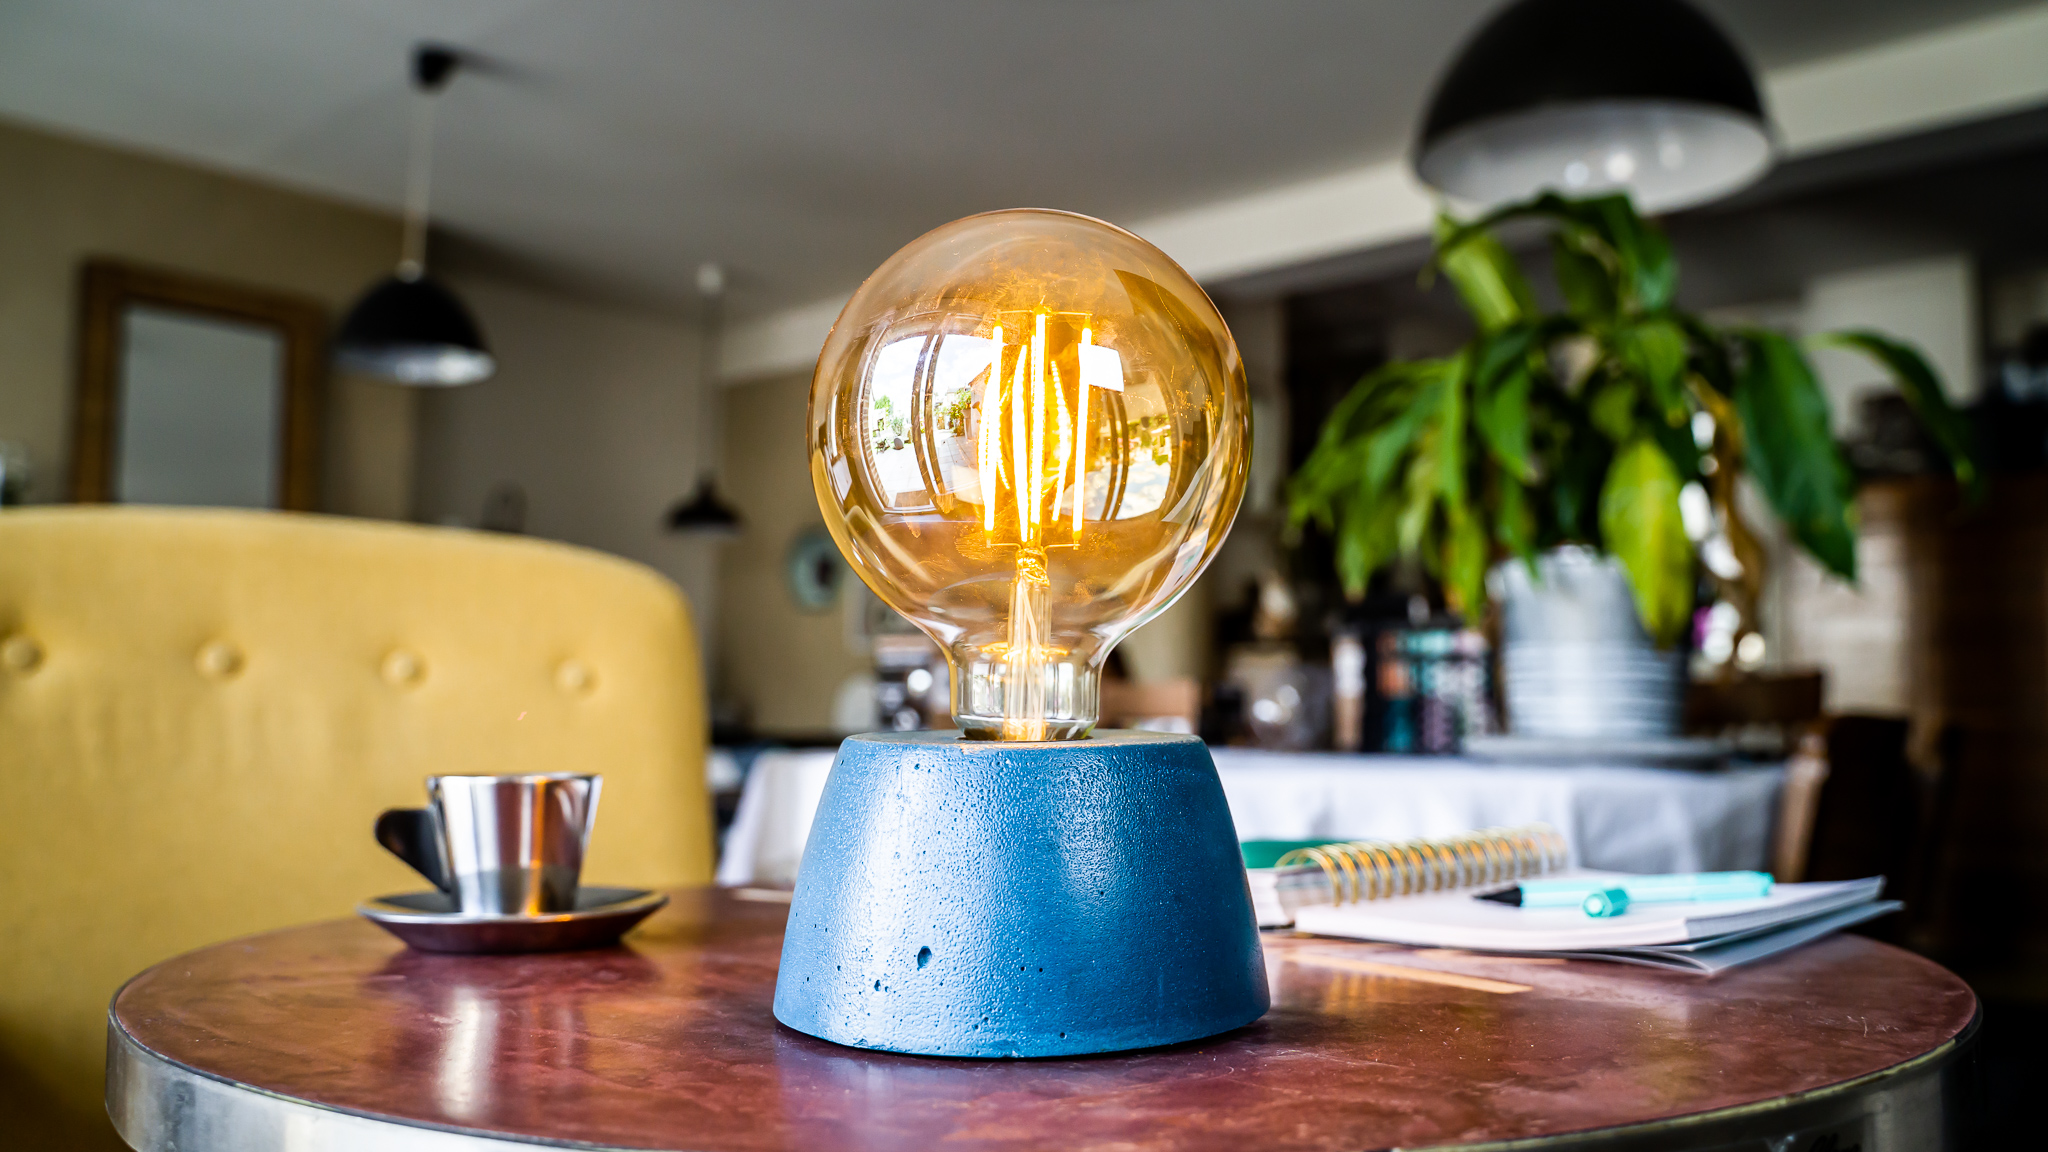 Lampe dôme en béton bleu pétrole fabrication artisanale